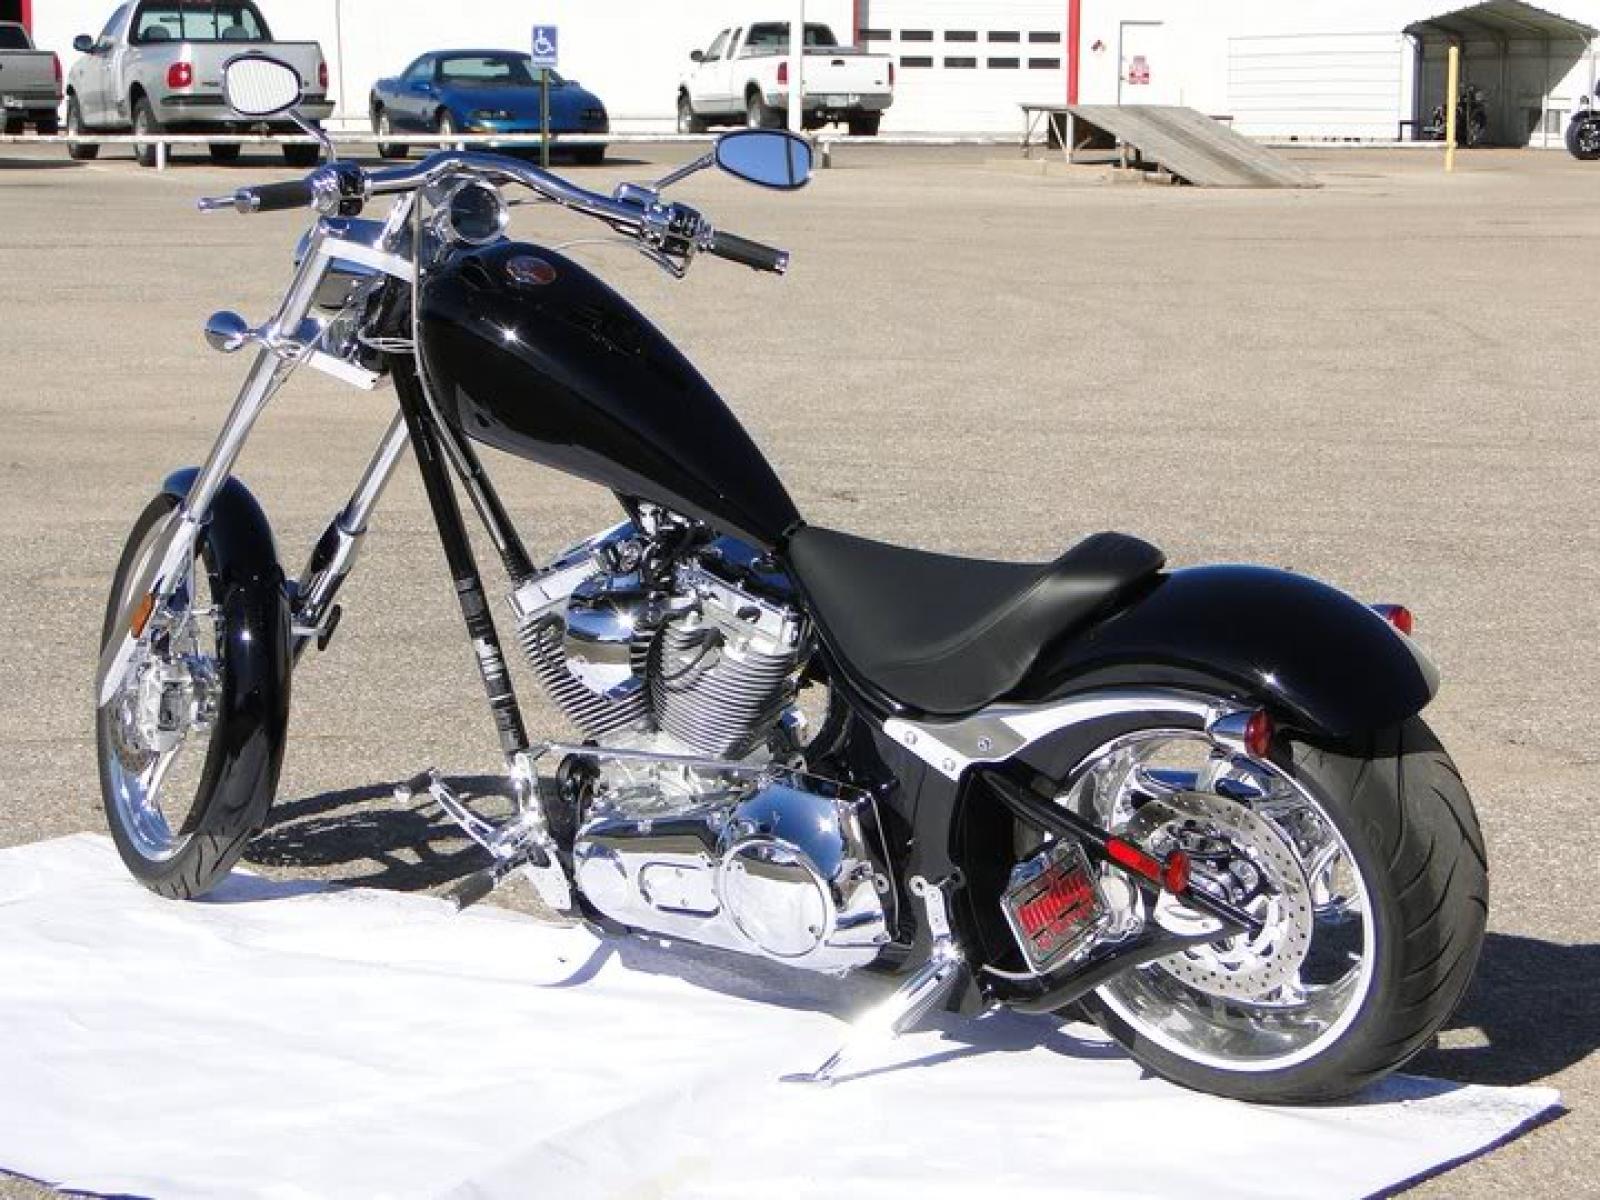 2005 big dog bulldog wiring diagram led light bar without relay motorcycles forum disrespect1st com k 9 250 moto zombdrive